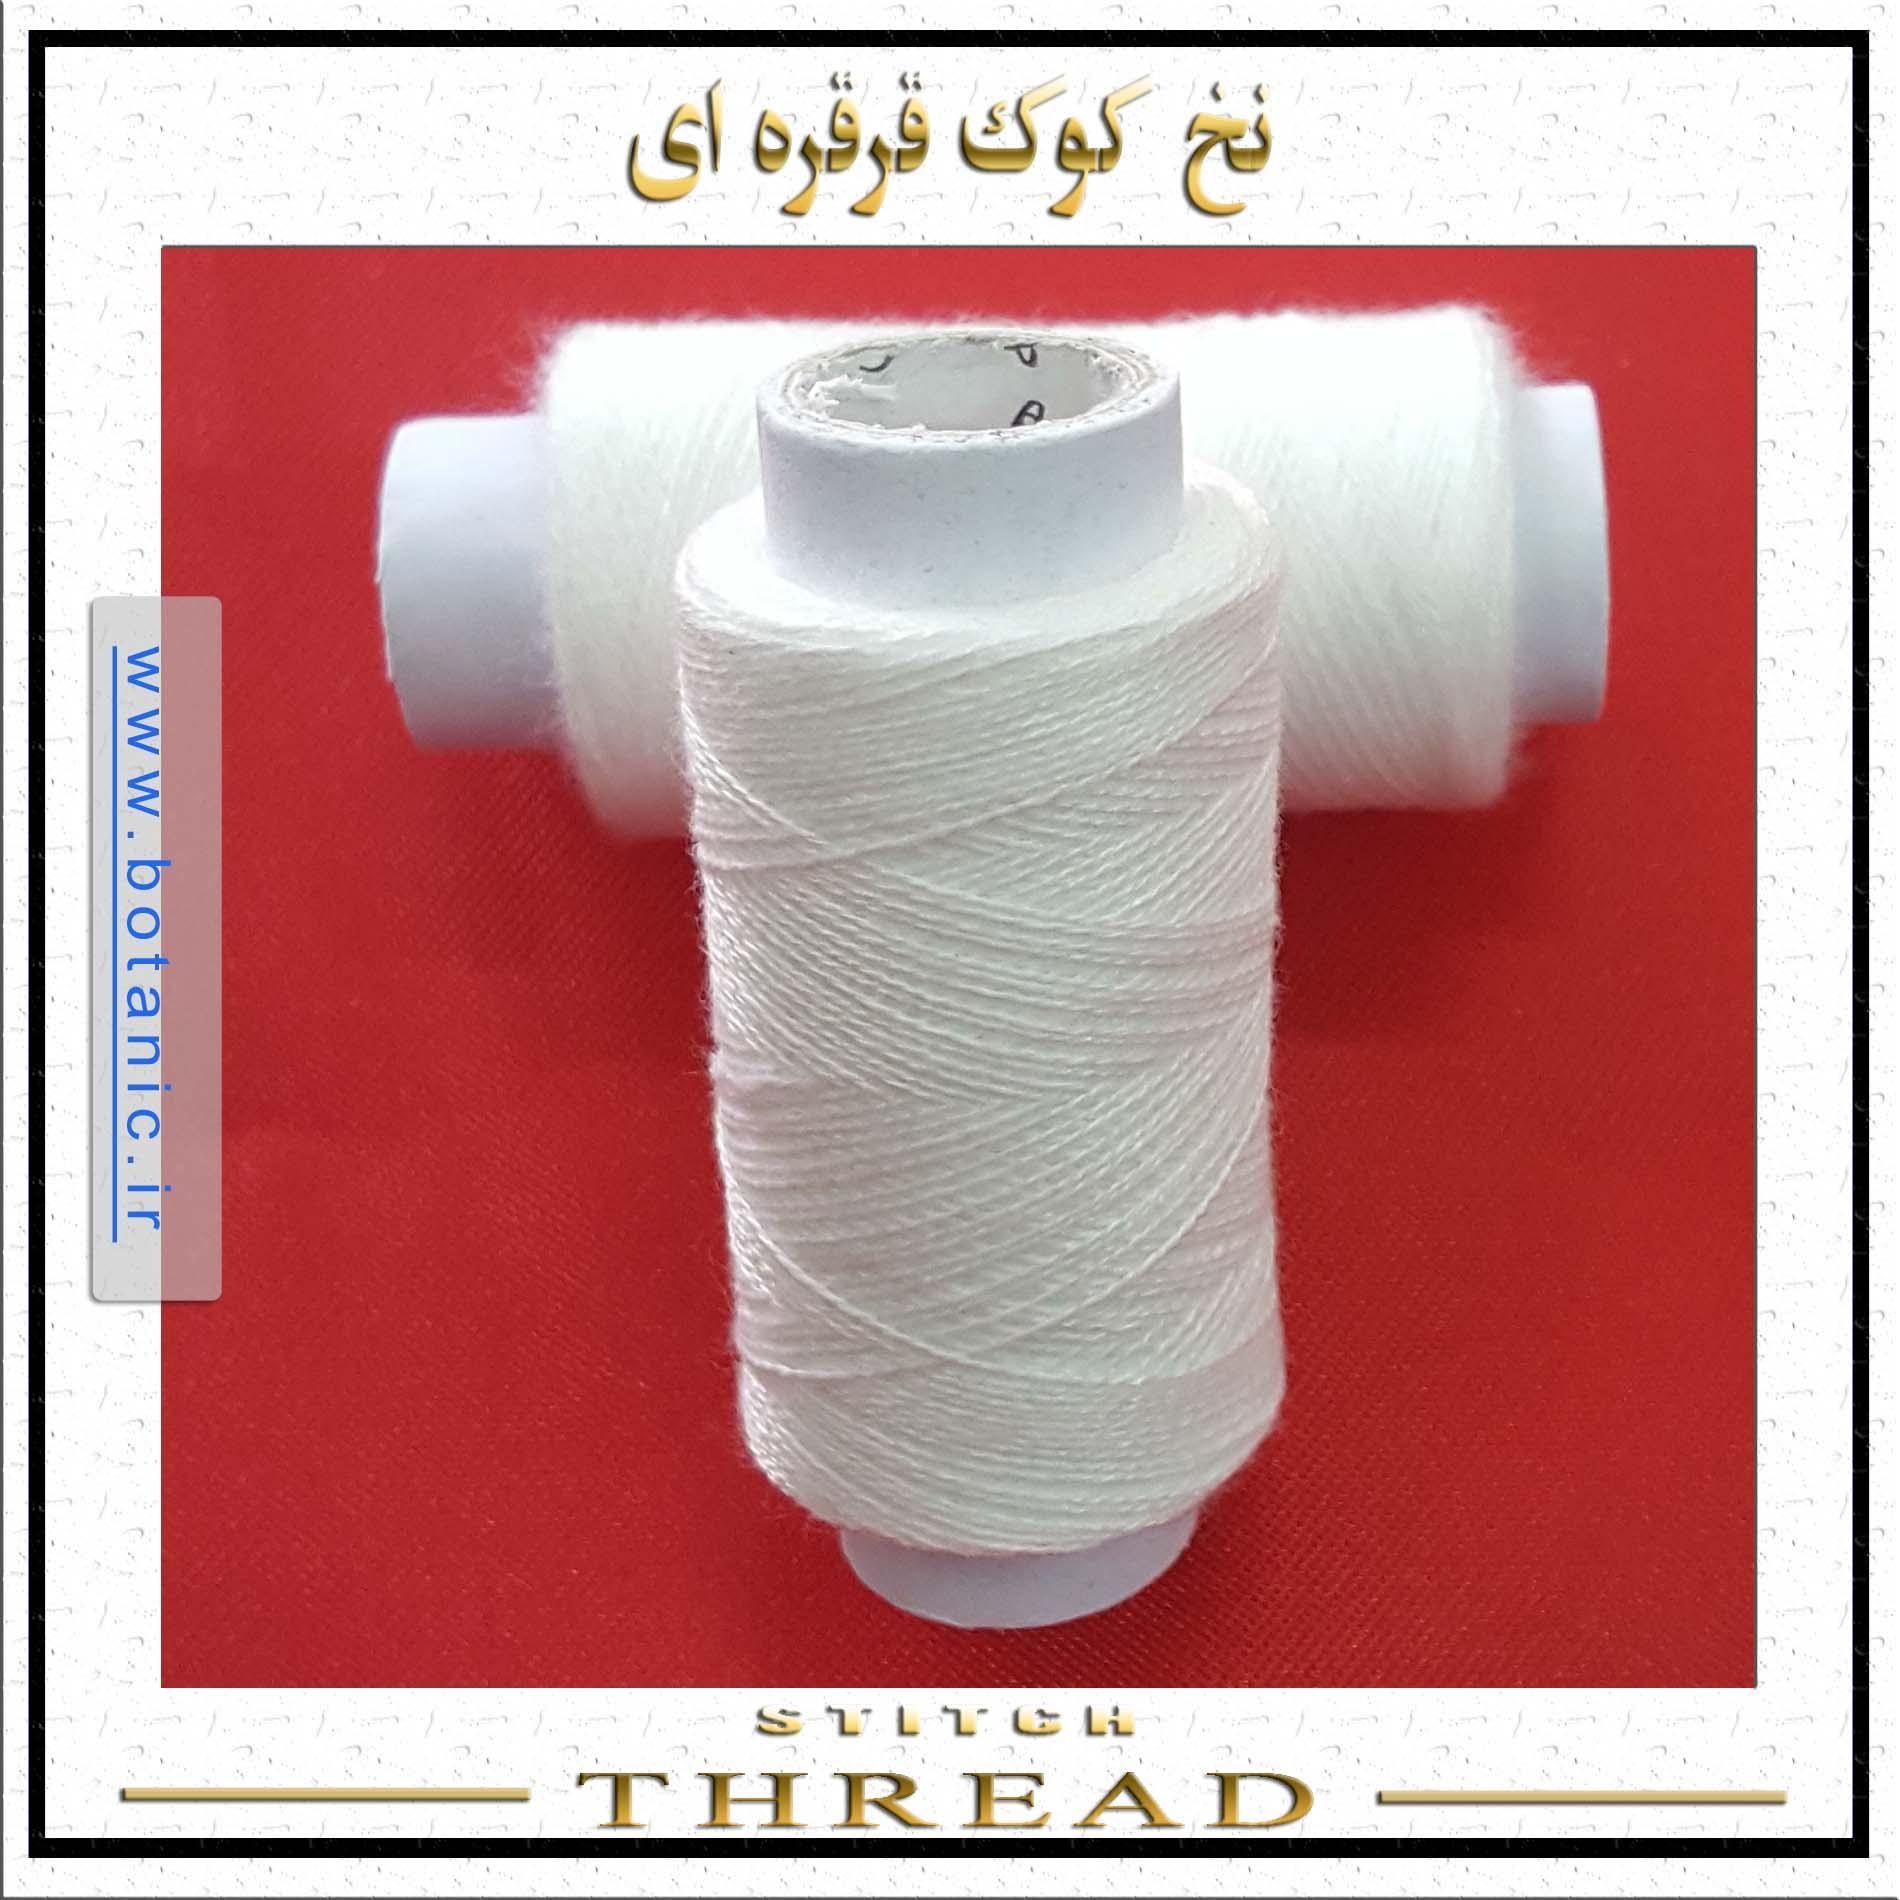 Stitch Thread